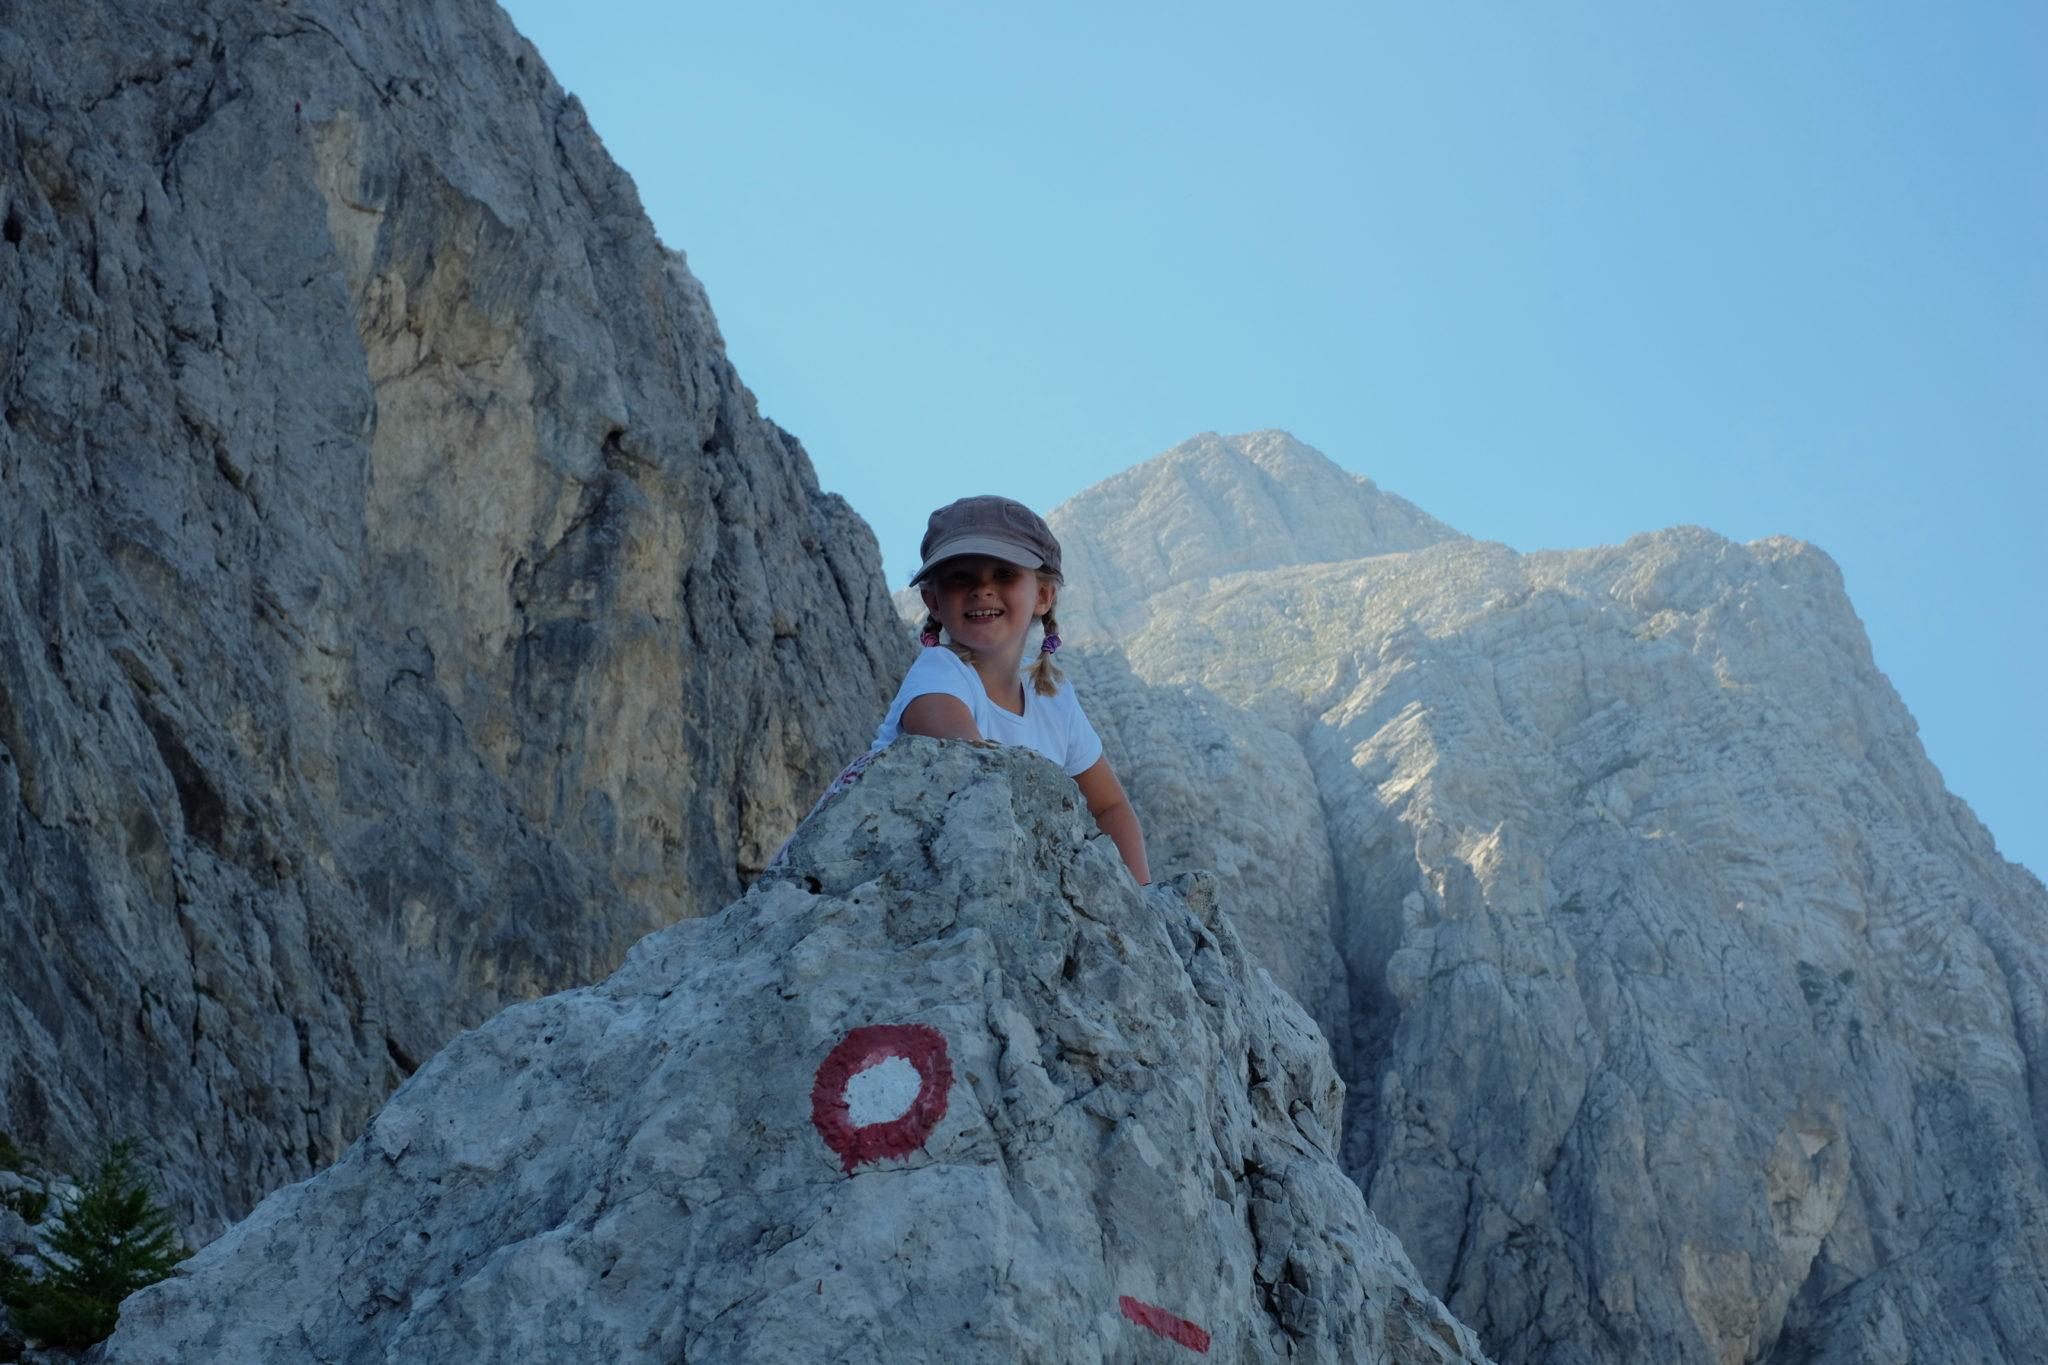 Hanzova trail below Mt. Mojstrovka and its breathtaking scenery